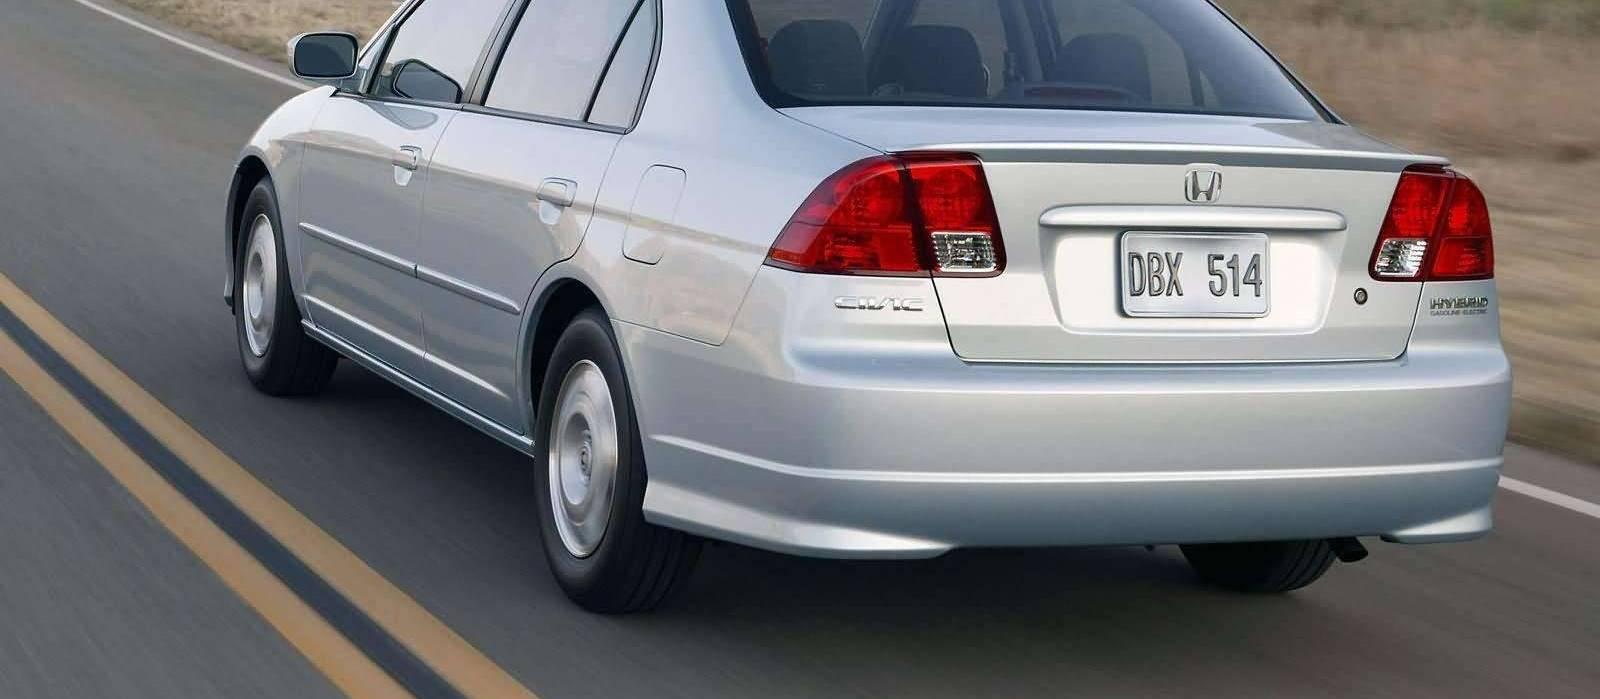 Honda Civic Hybrid 2005 Exterior Rear Side View